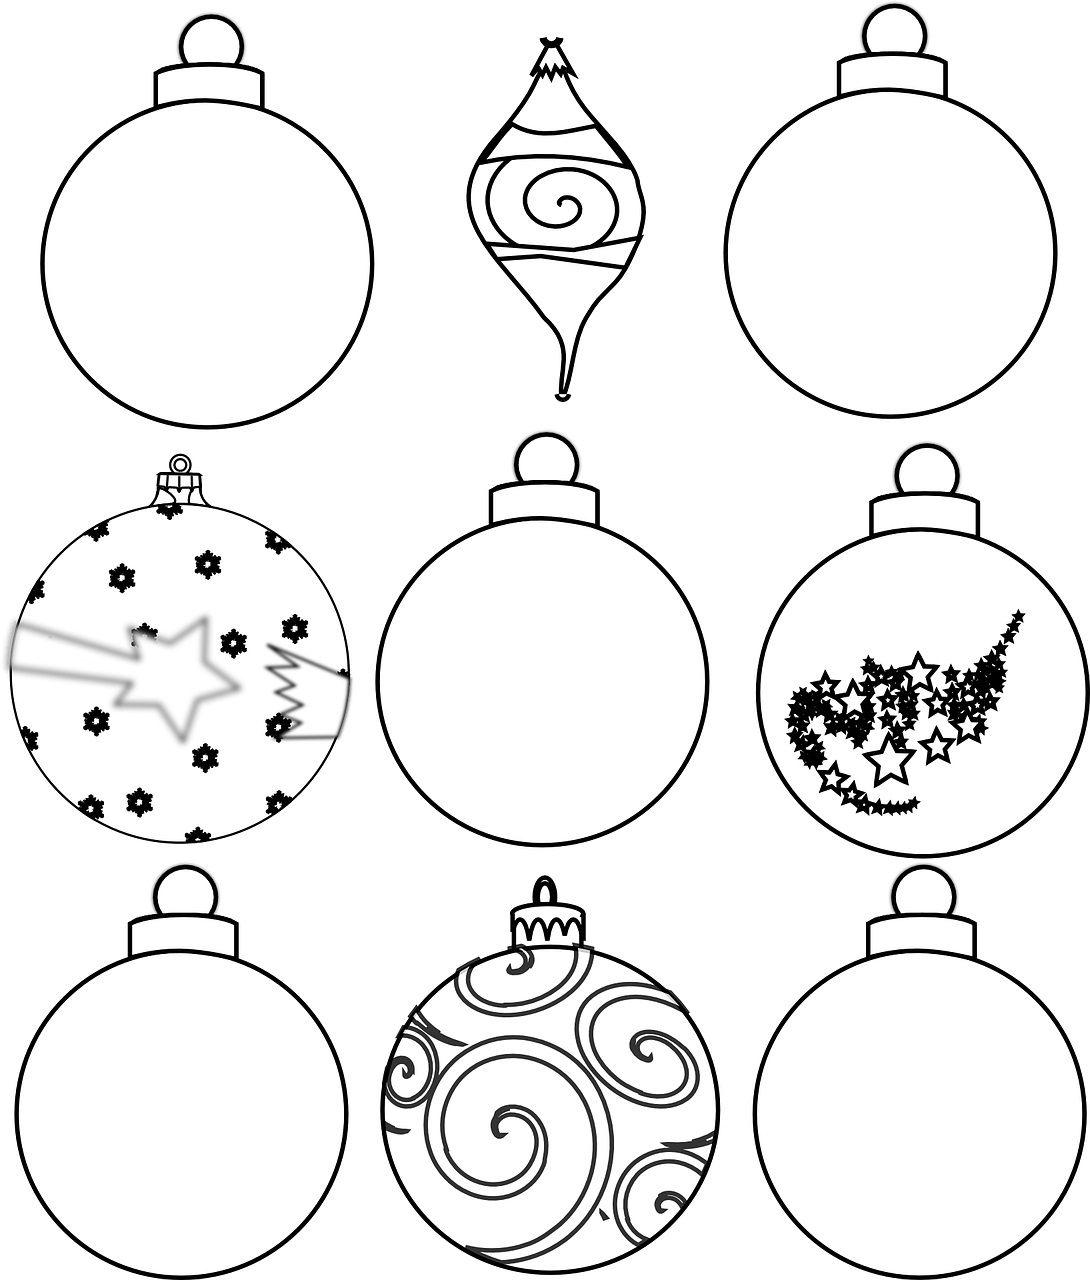 002 Excellent Printable Christma Ornament Template Sample  Templates Stencil Felt Pattern TreeFull